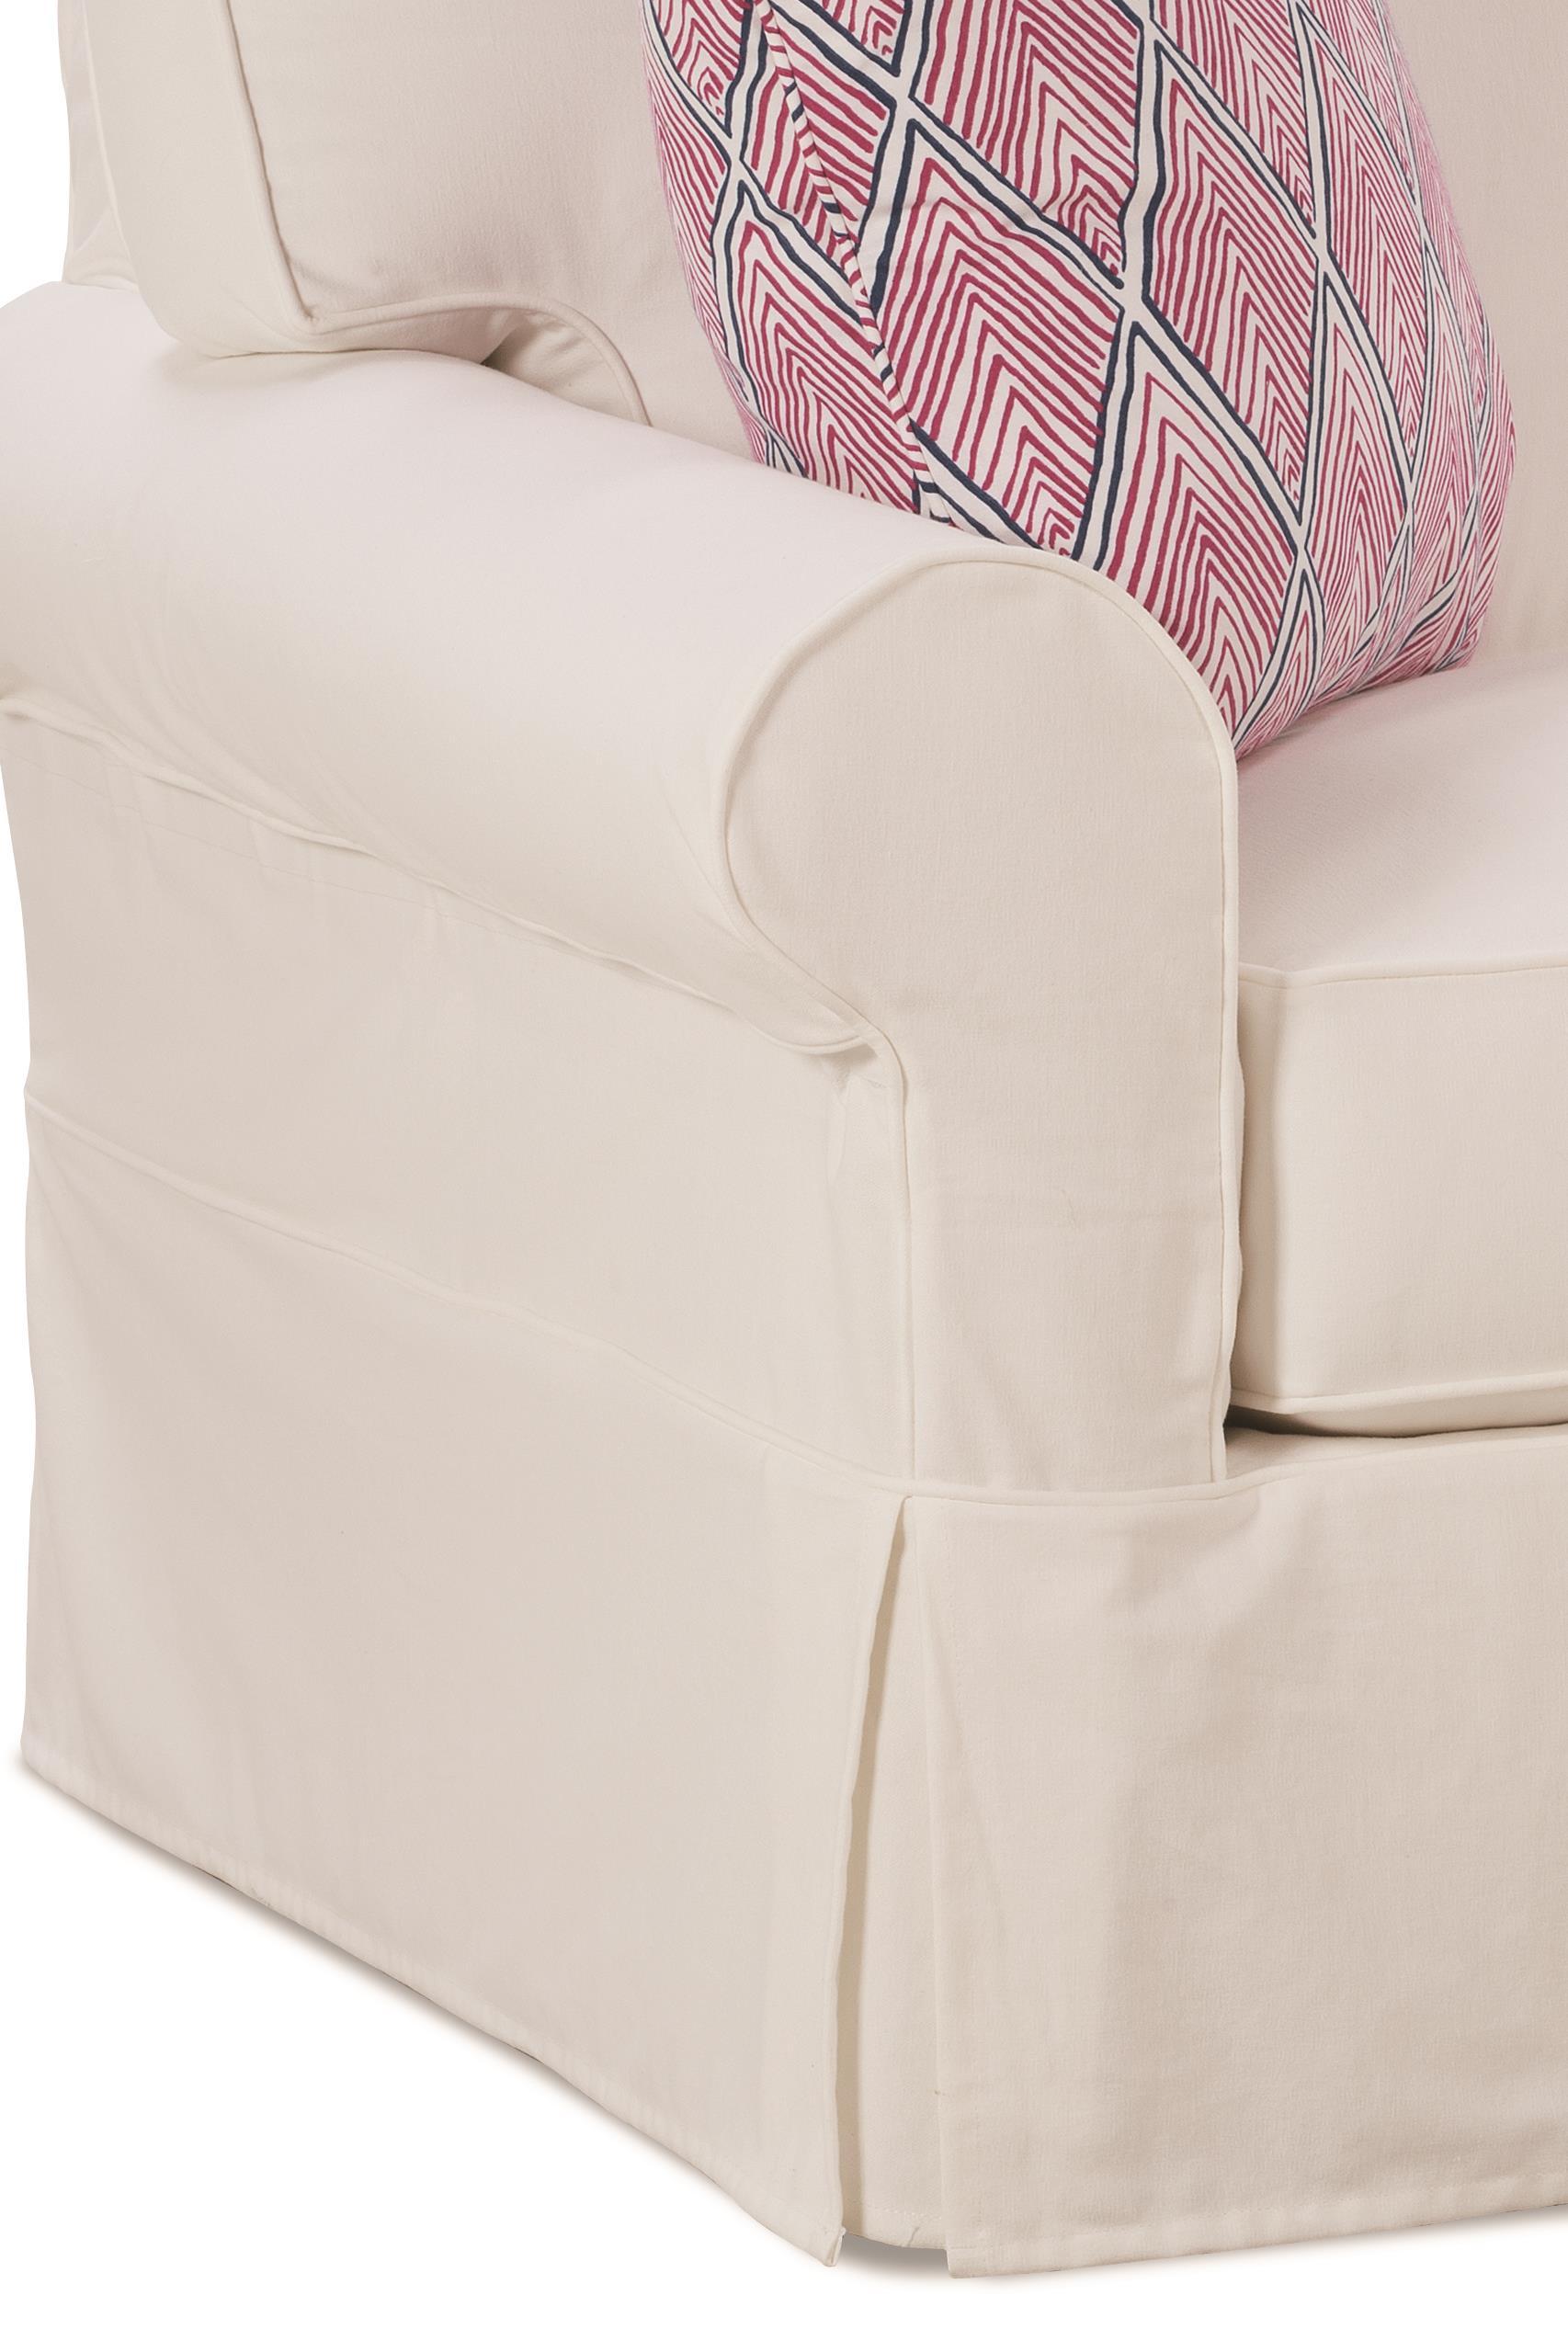 Tremendous Easton Slipcover Sofa By Rowe Furniture Creativecarmelina Interior Chair Design Creativecarmelinacom